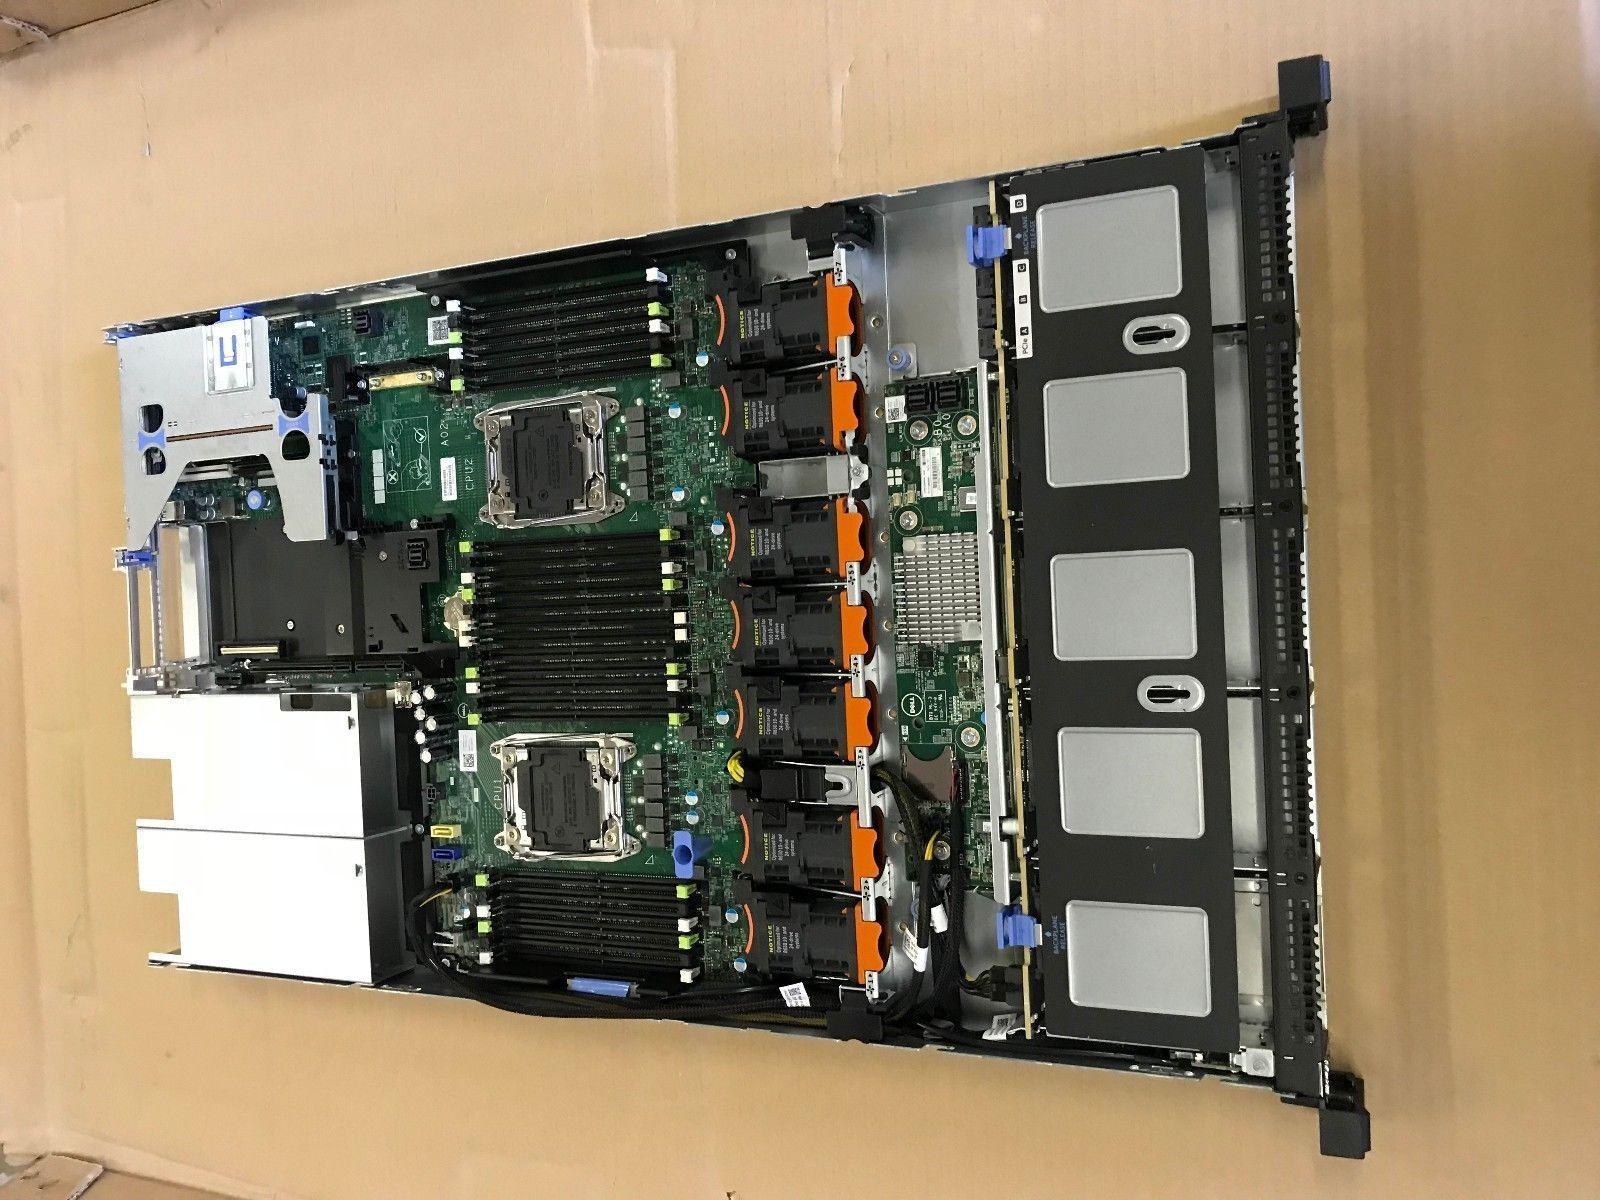 Dell PowerEdge R630 BareBone 10BAY 1U Rack Server Motherboard FAN chassis